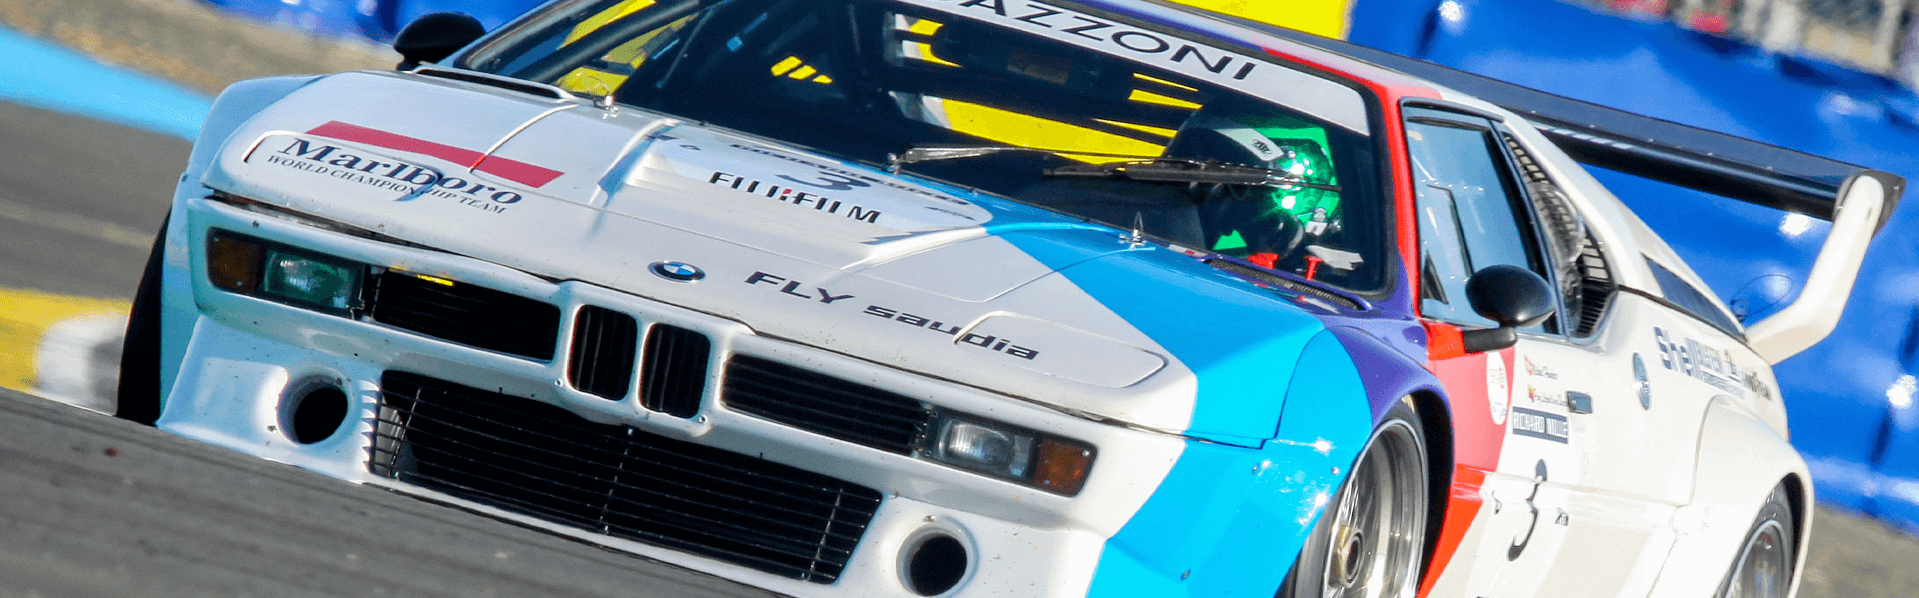 Lycian Header 2020 - Le Mans Classic-sm